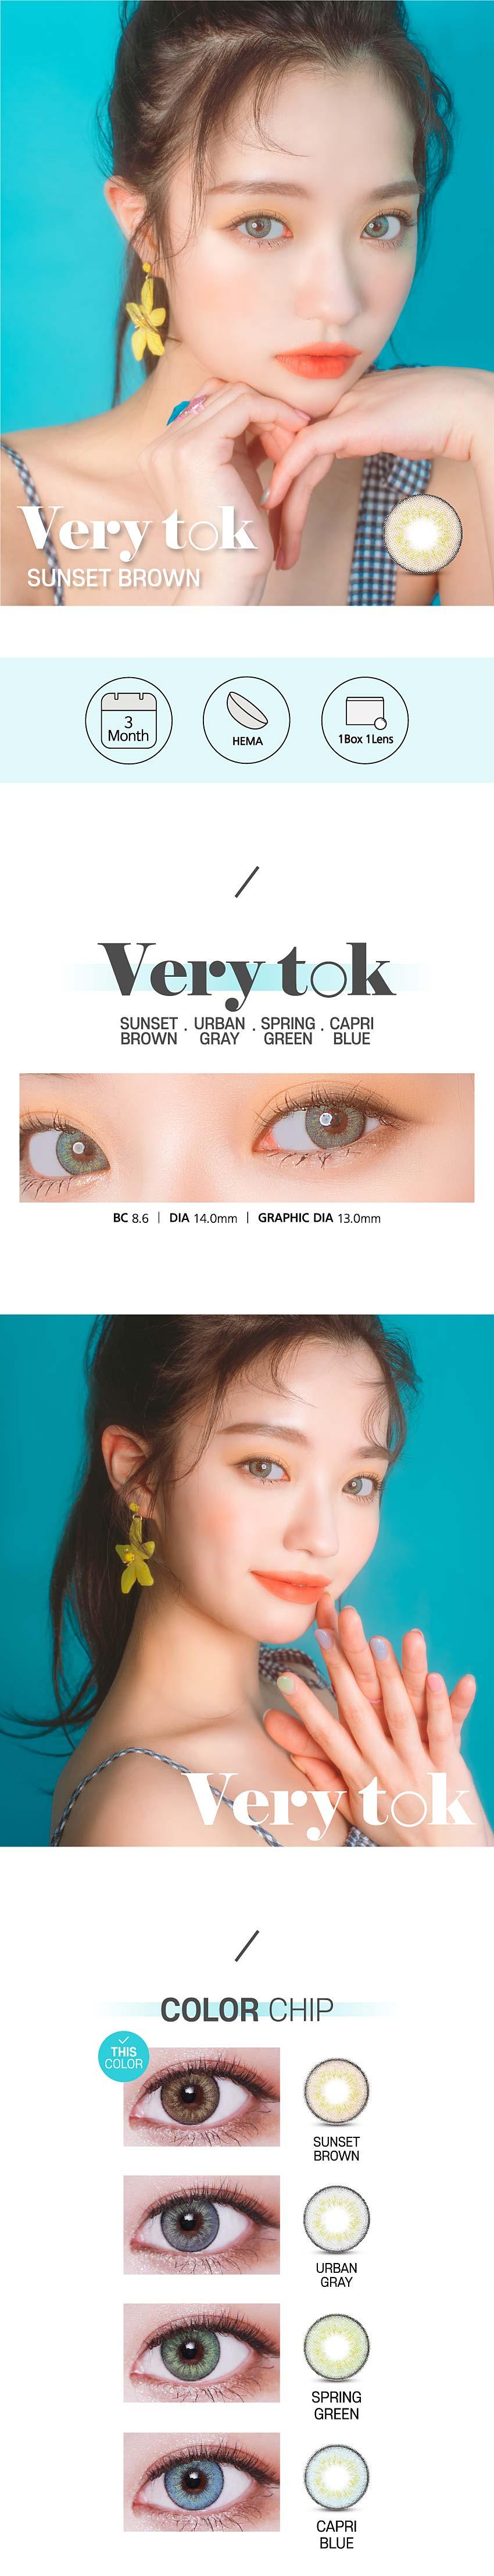 verytok-sunset-brown-korean-contacts1.jpg